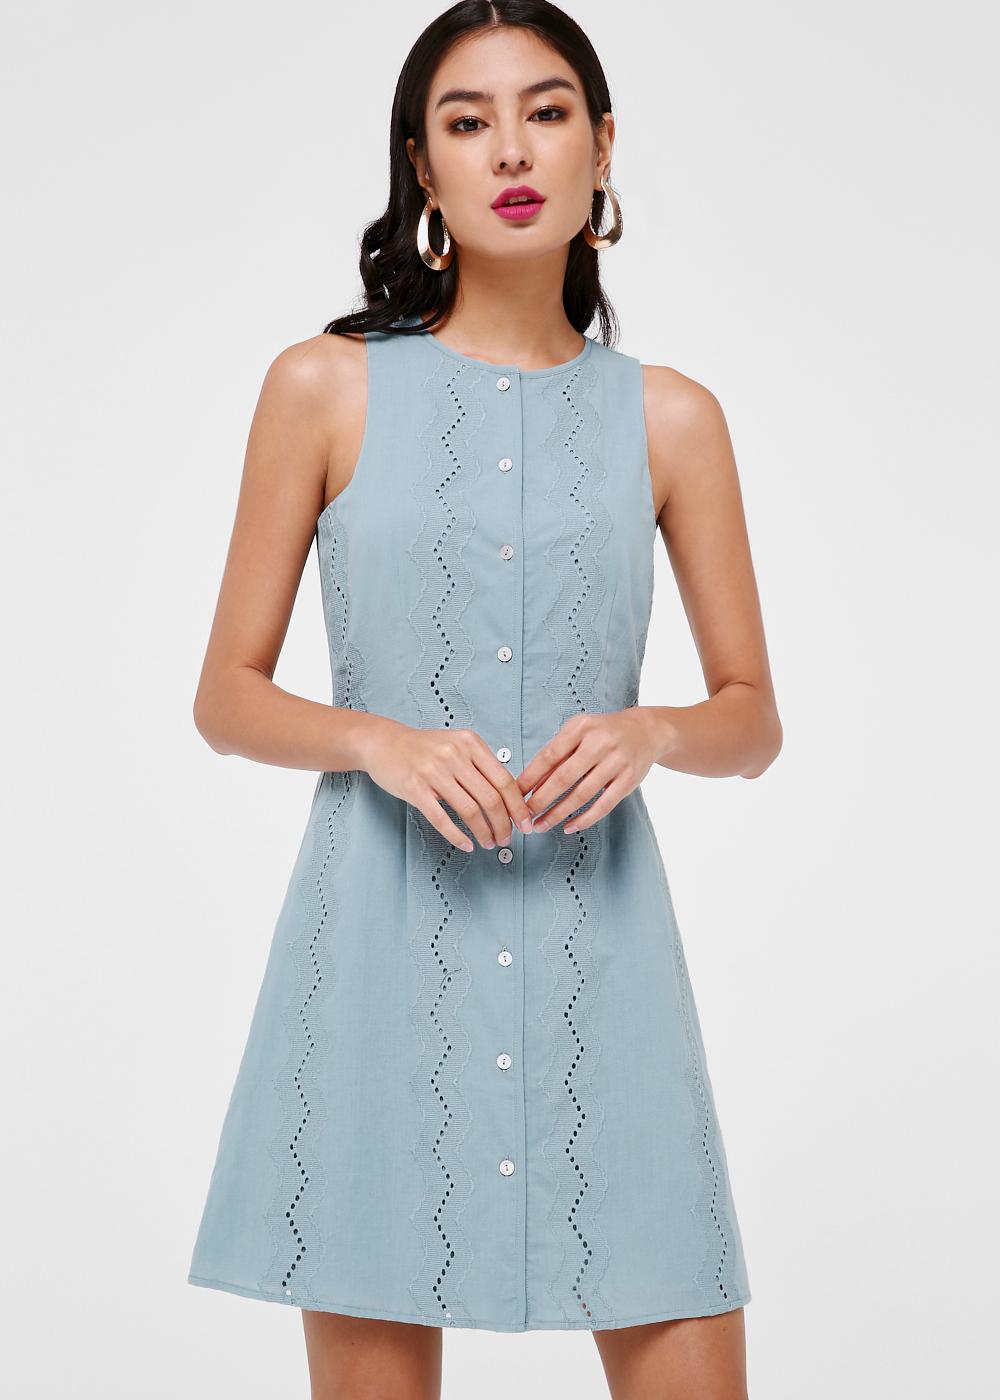 Valencia Broderie Anglaise A-line Dress